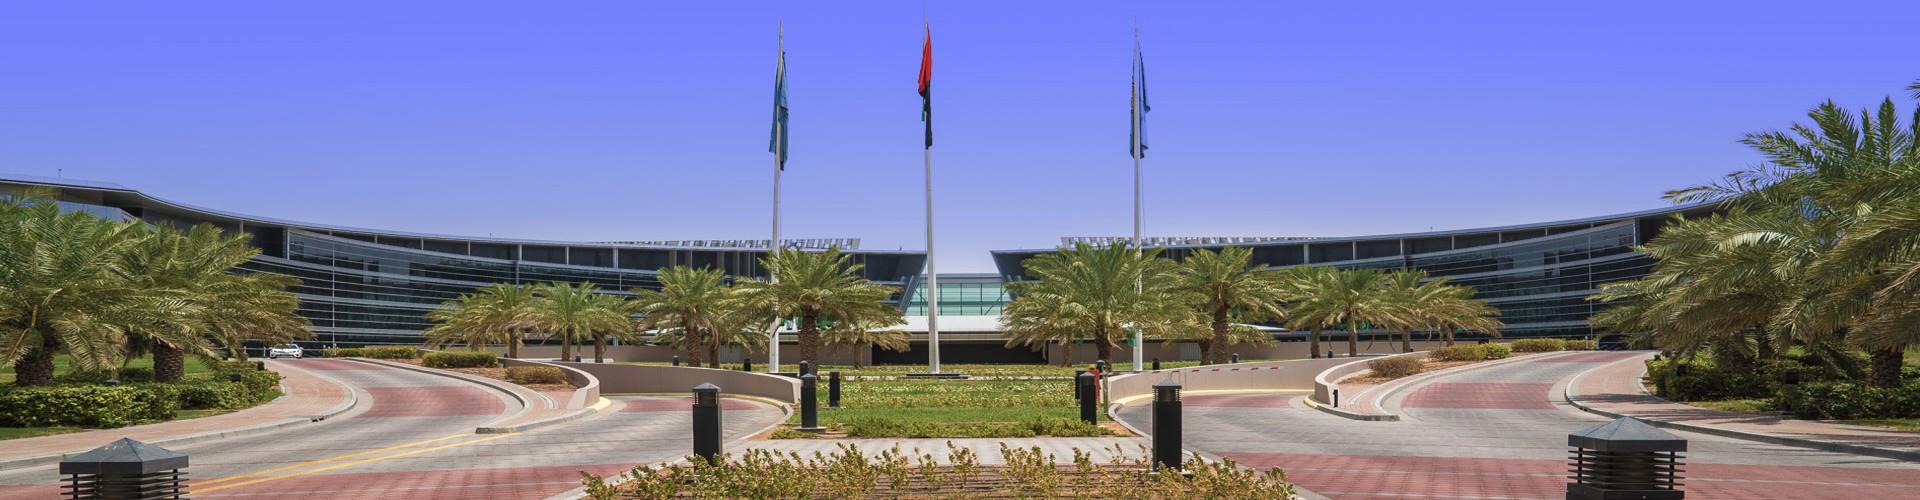 University of sharjah kalba